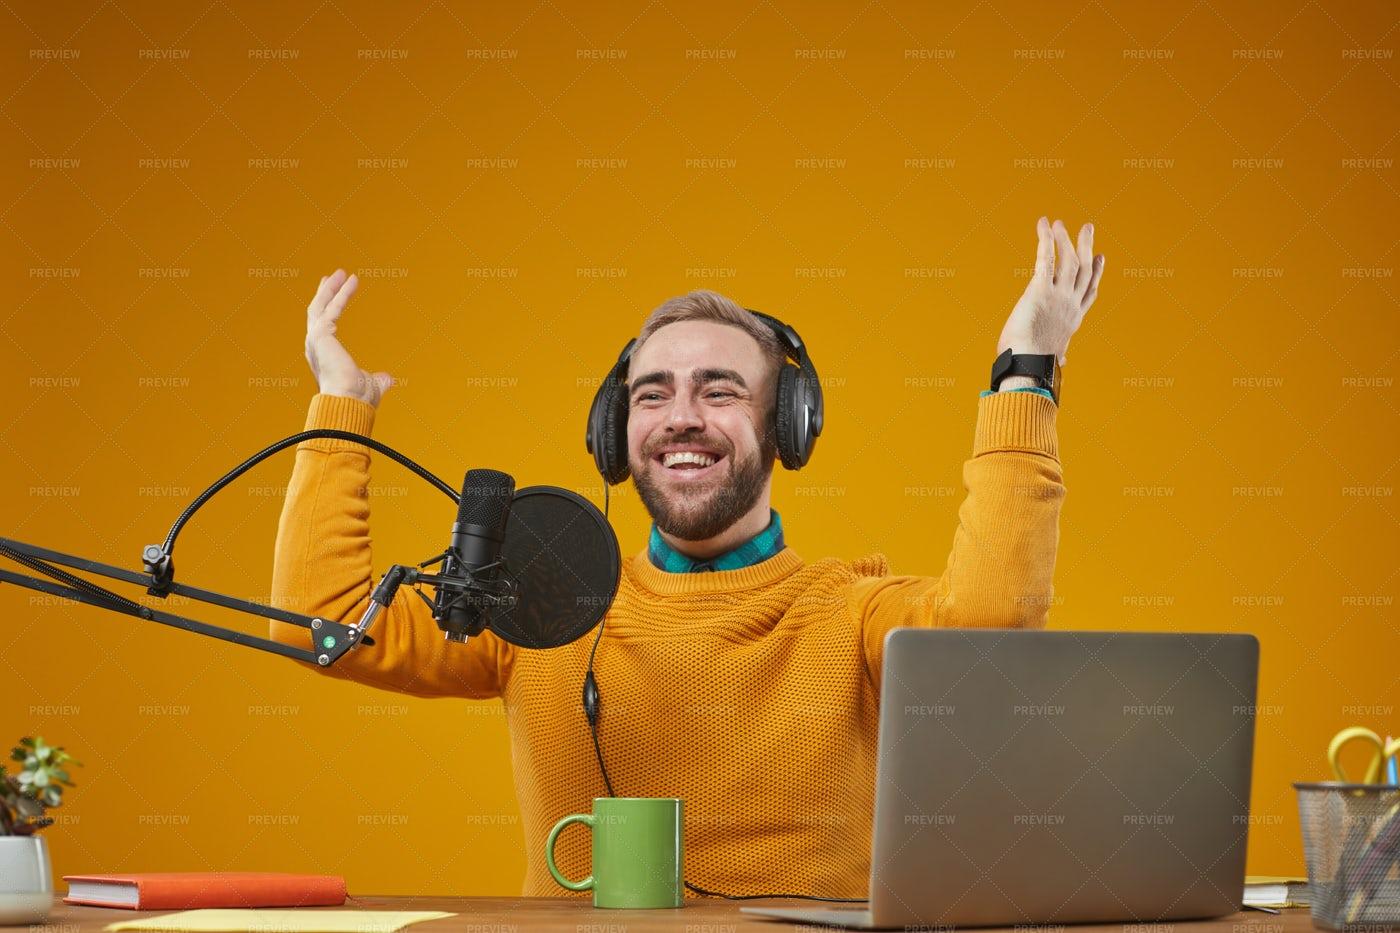 Radio Presenter During Work: Stock Photos